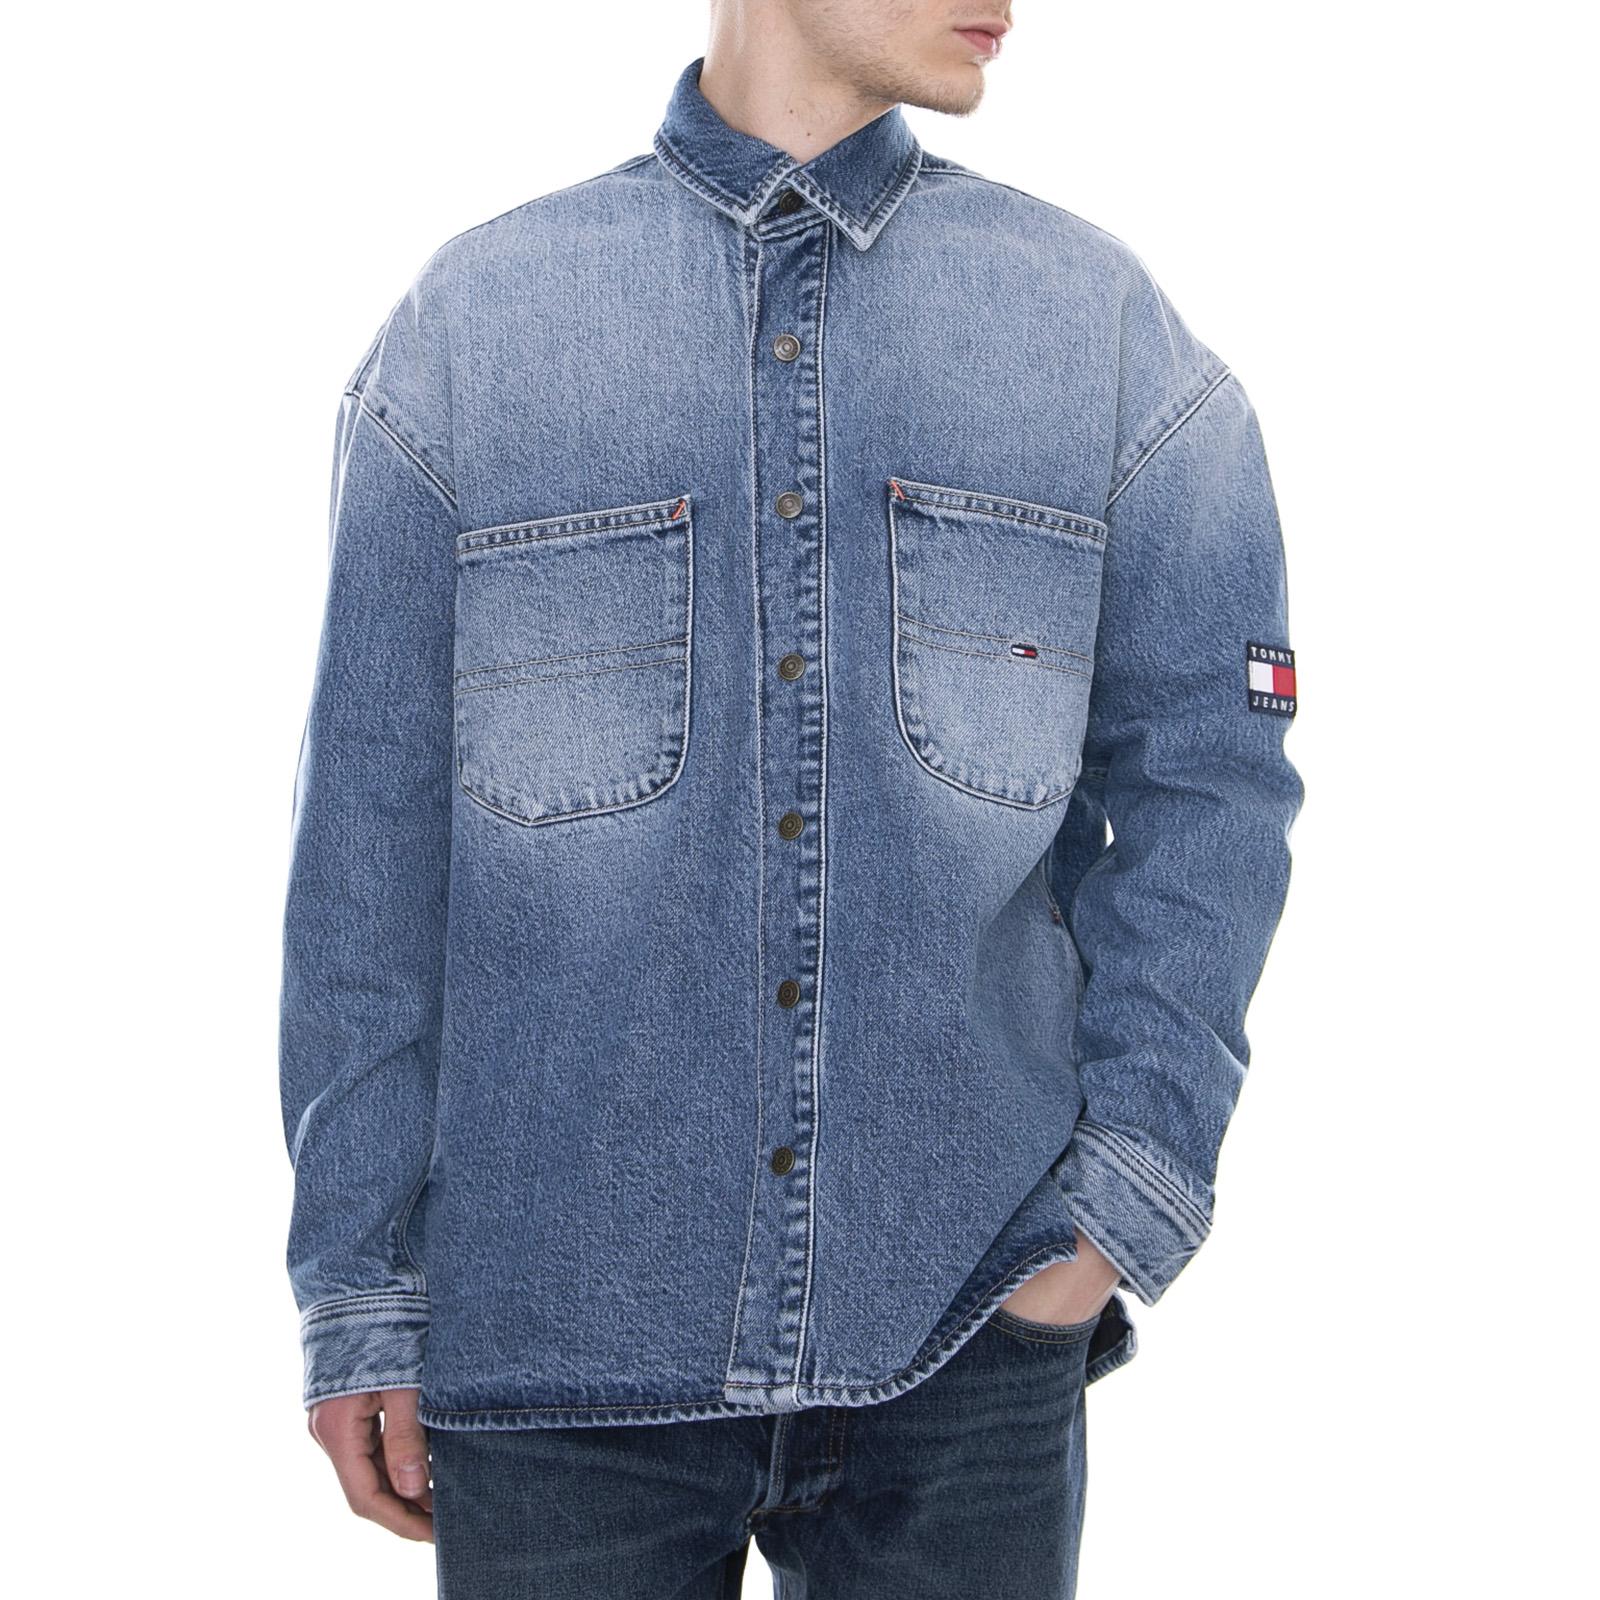 brand new d609a 6c04e Details about Tommy Hilfiger Denim Overshirt Park Light Bl Rig Shirt Jeans  Oversize Man